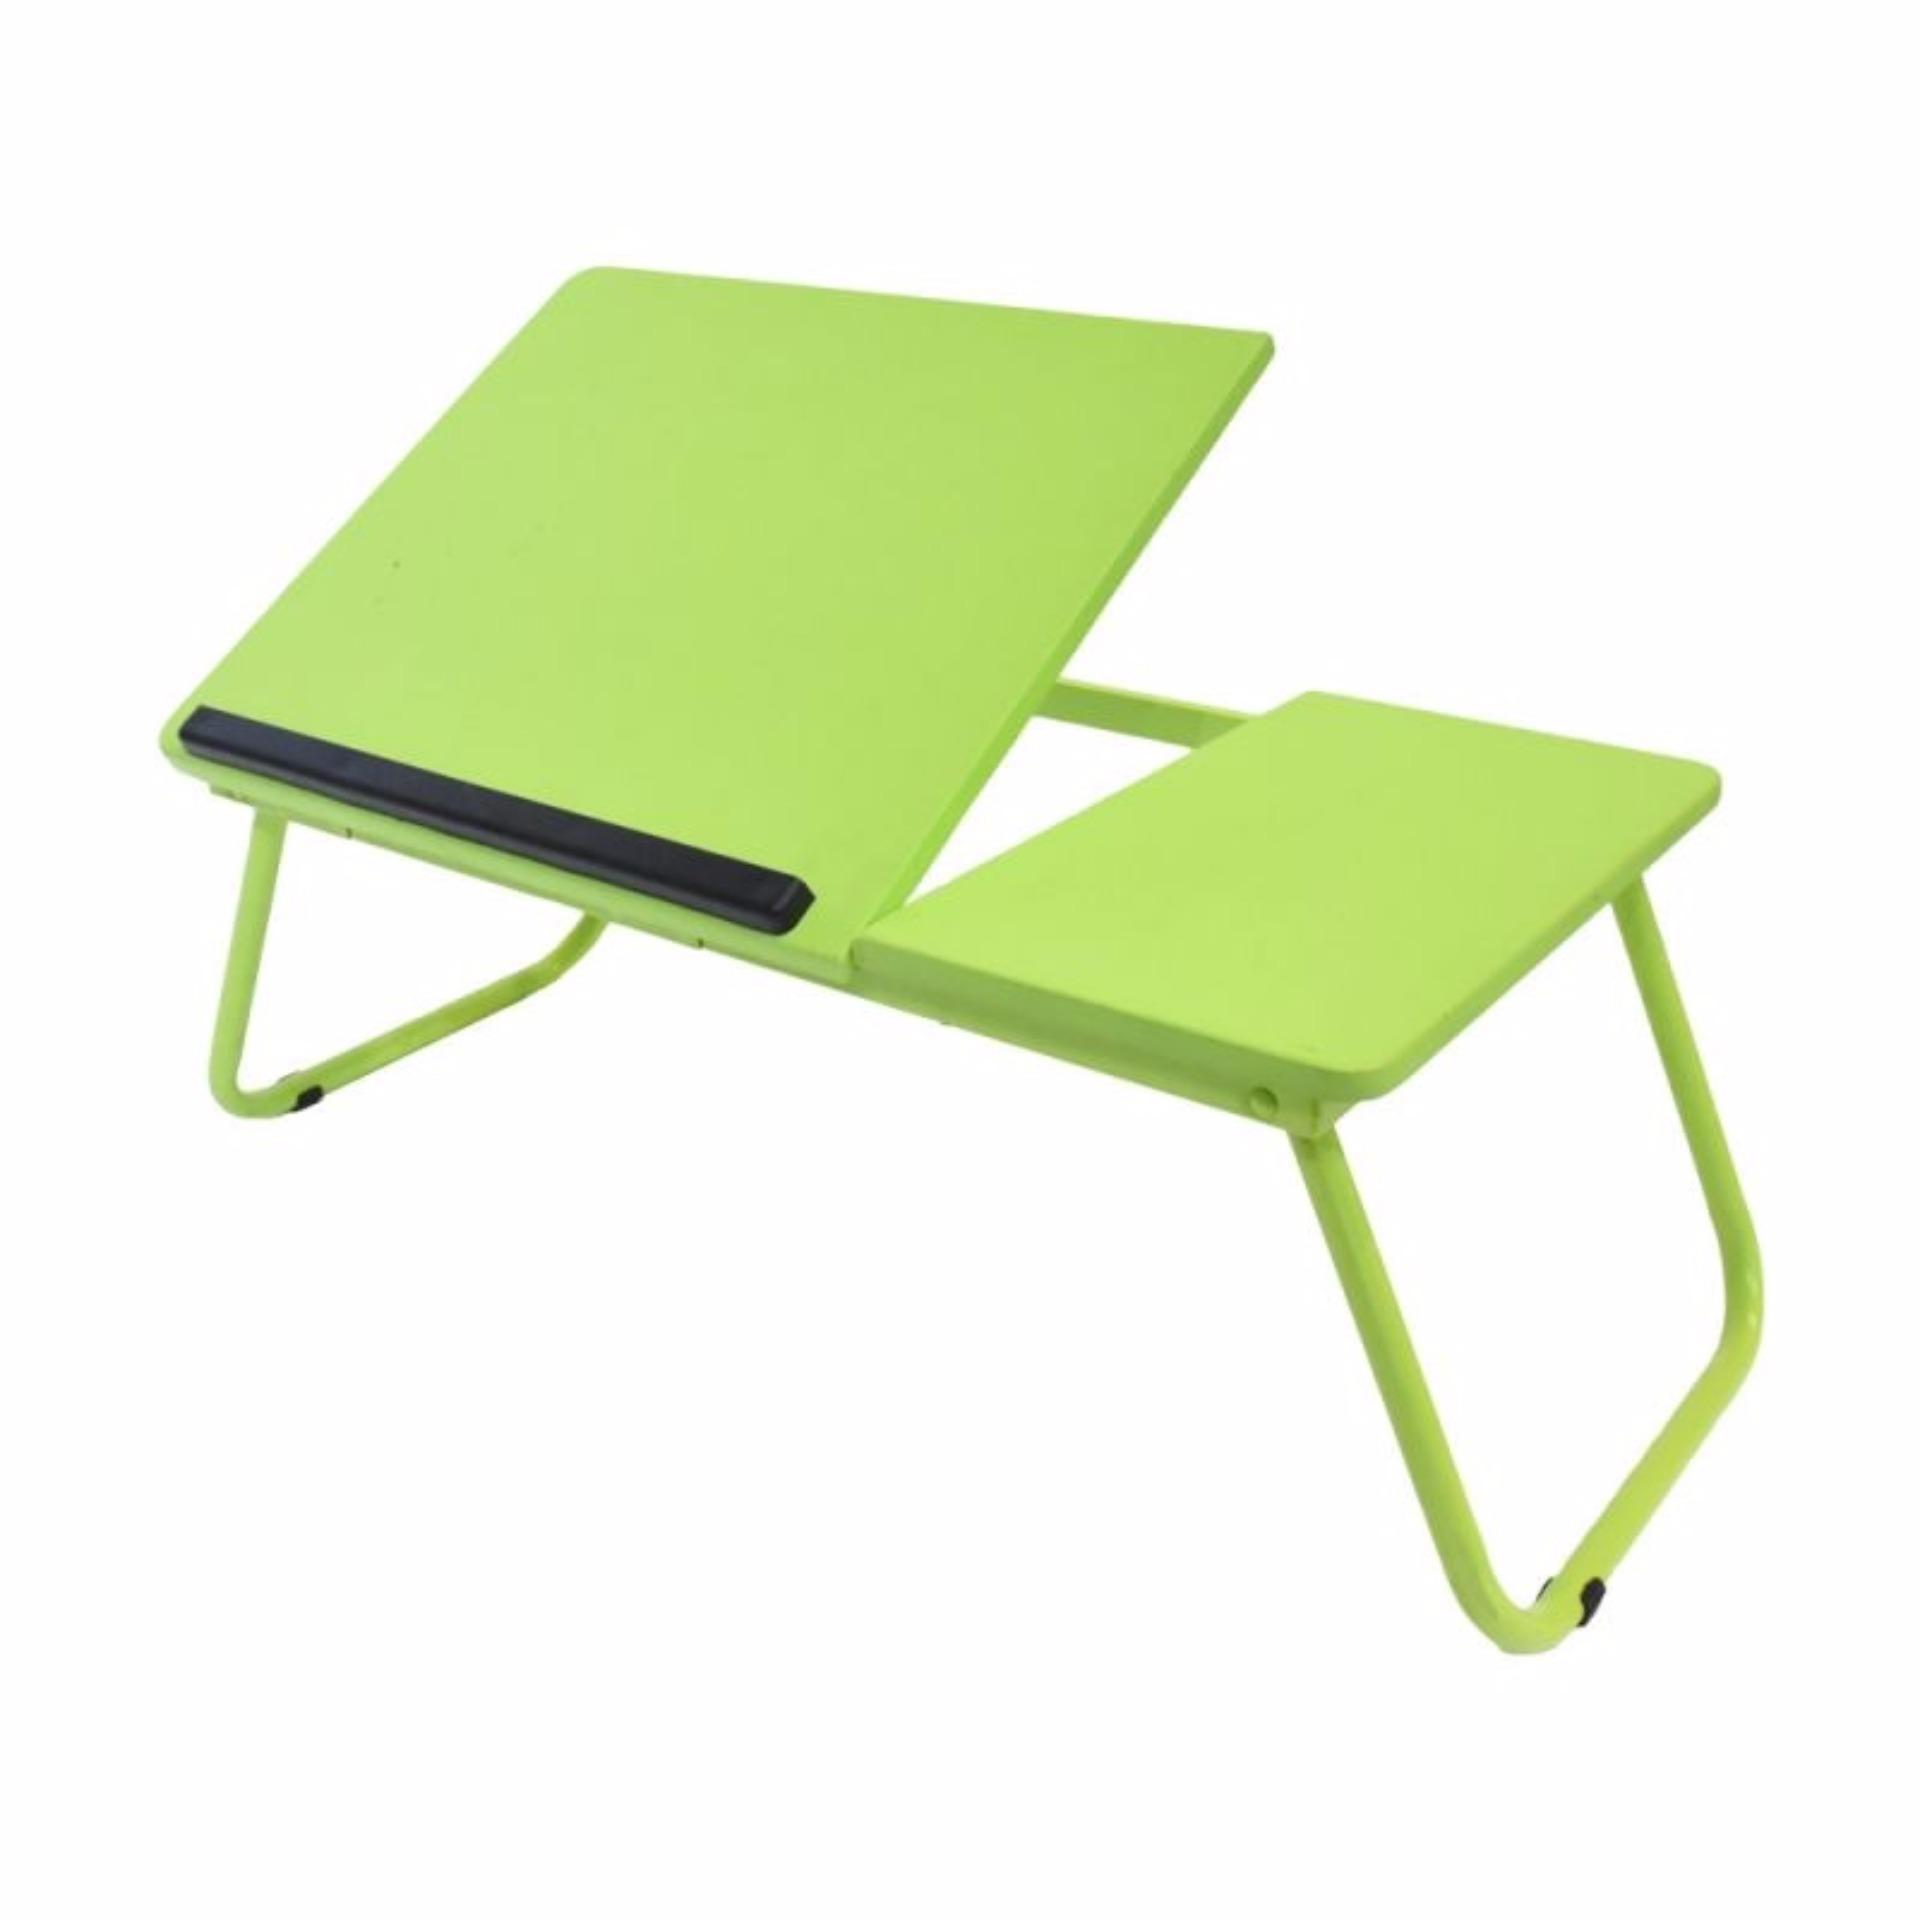 Meja Laptop Notebook Portable Lipat Daftar Harga Terkini Dan Informa Folding Table Oxy